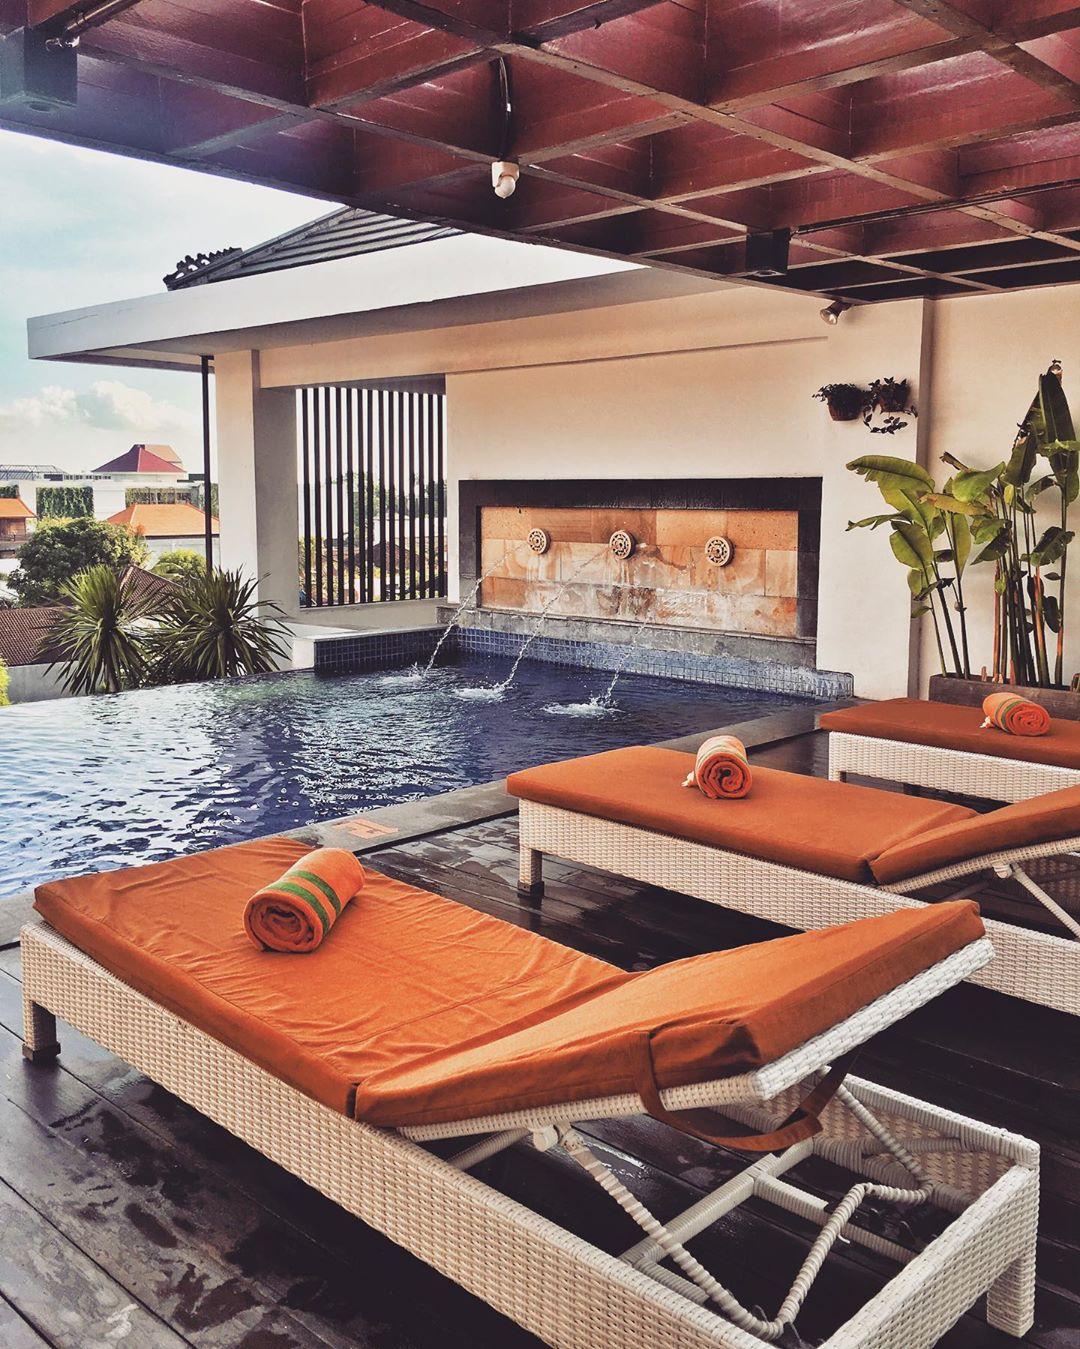 Seminyak Hotels: Harris Hotel Seminyak by @harrisseminyak